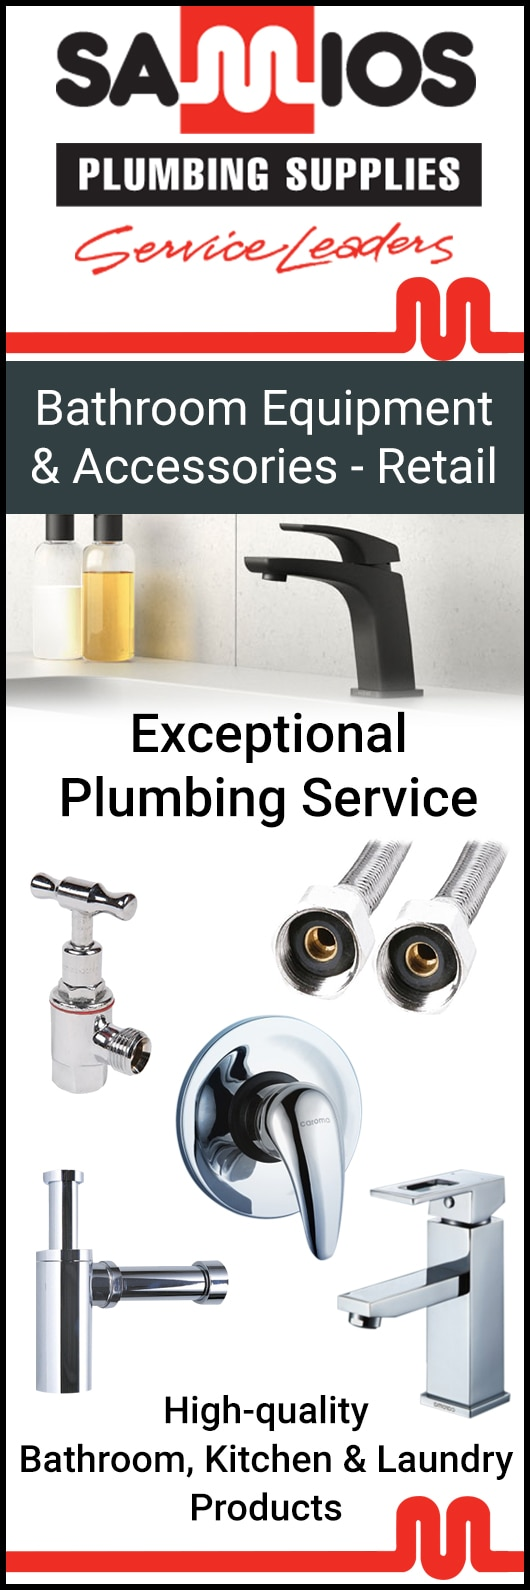 Samios Plumbing - Bathroom Accessories & Equipment - Hobart